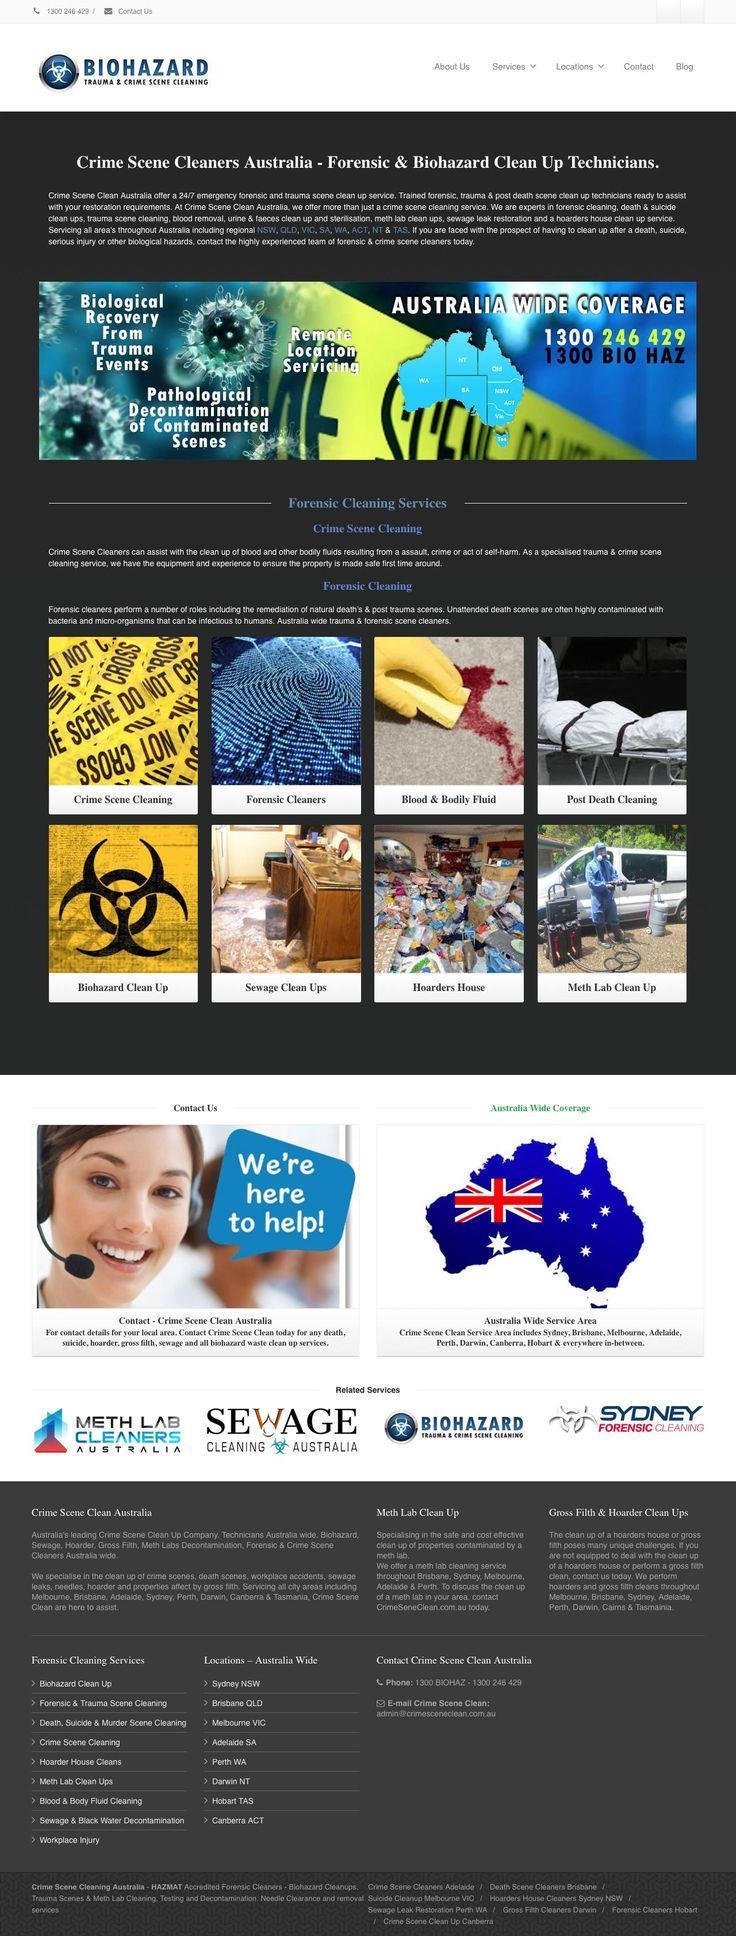 crimesceneclean.com.au - Crime Scene Clean   Forensic & Biohazard Cleaning Services - captured Oct. 20, 2016